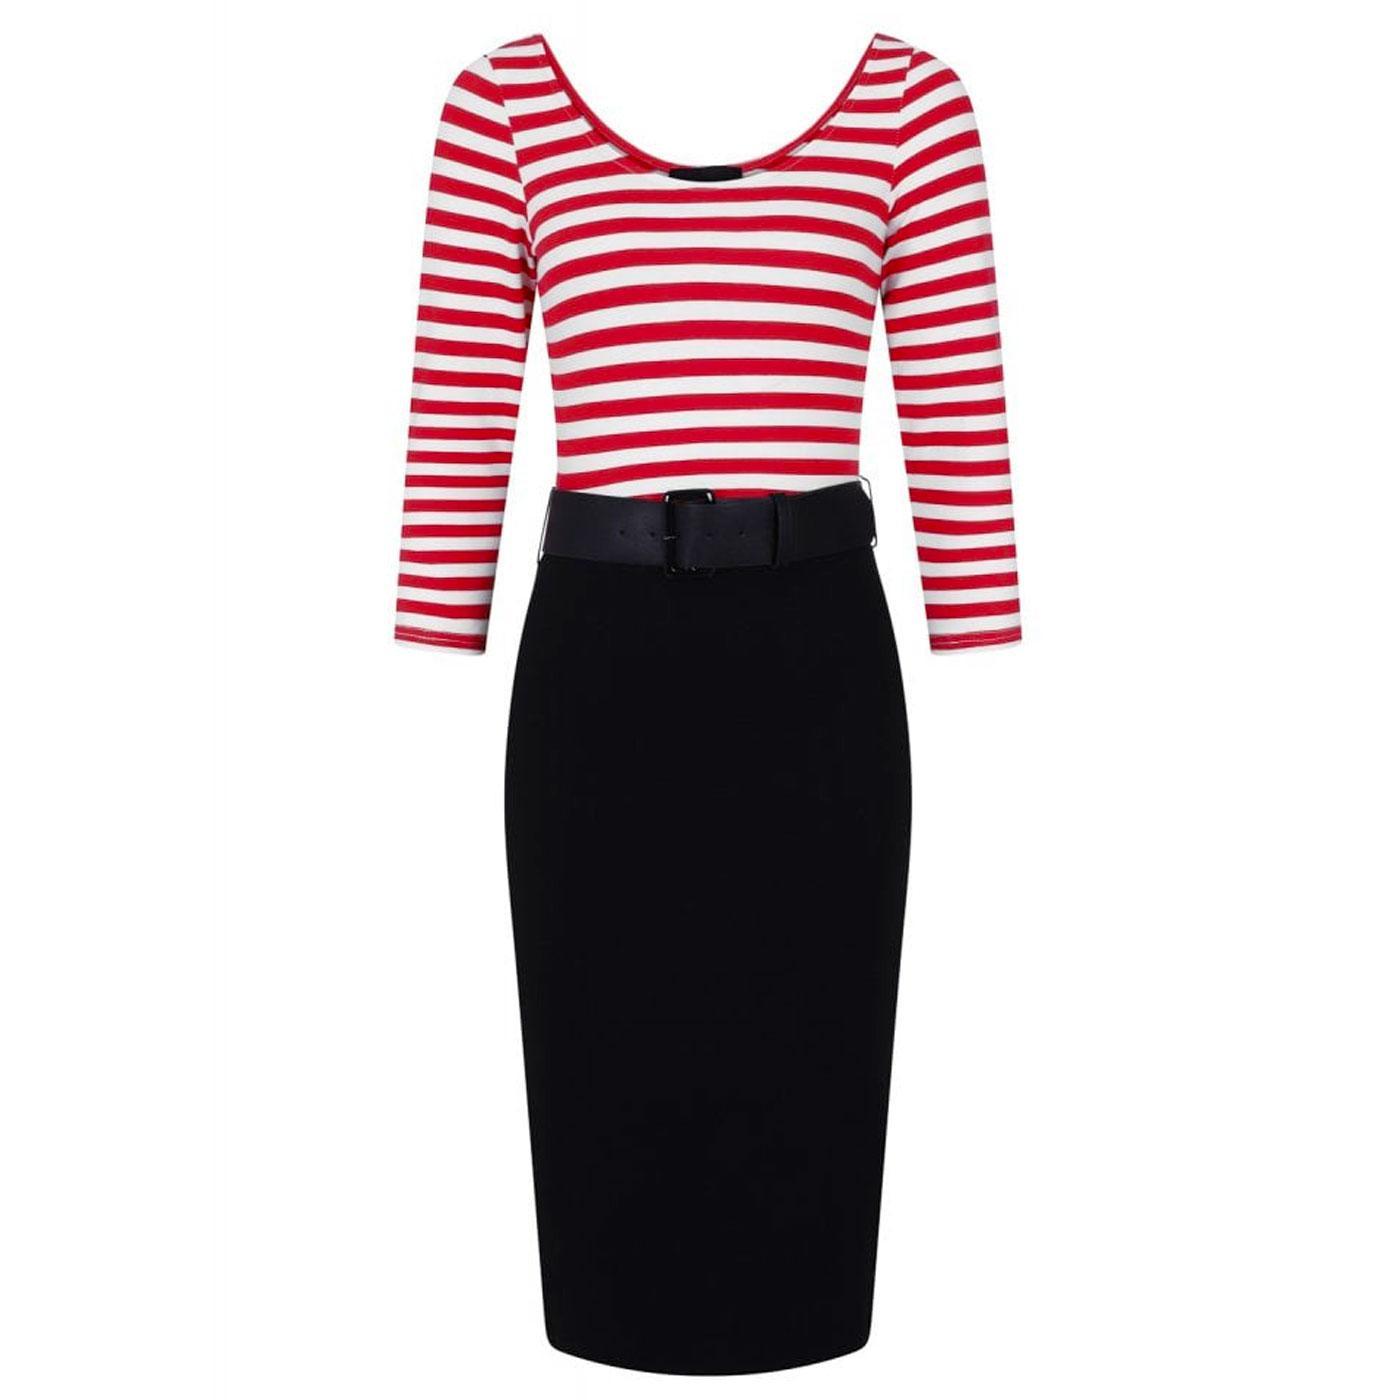 Manuela COLLECTIF Striped Pencil Dress BLACK/RED